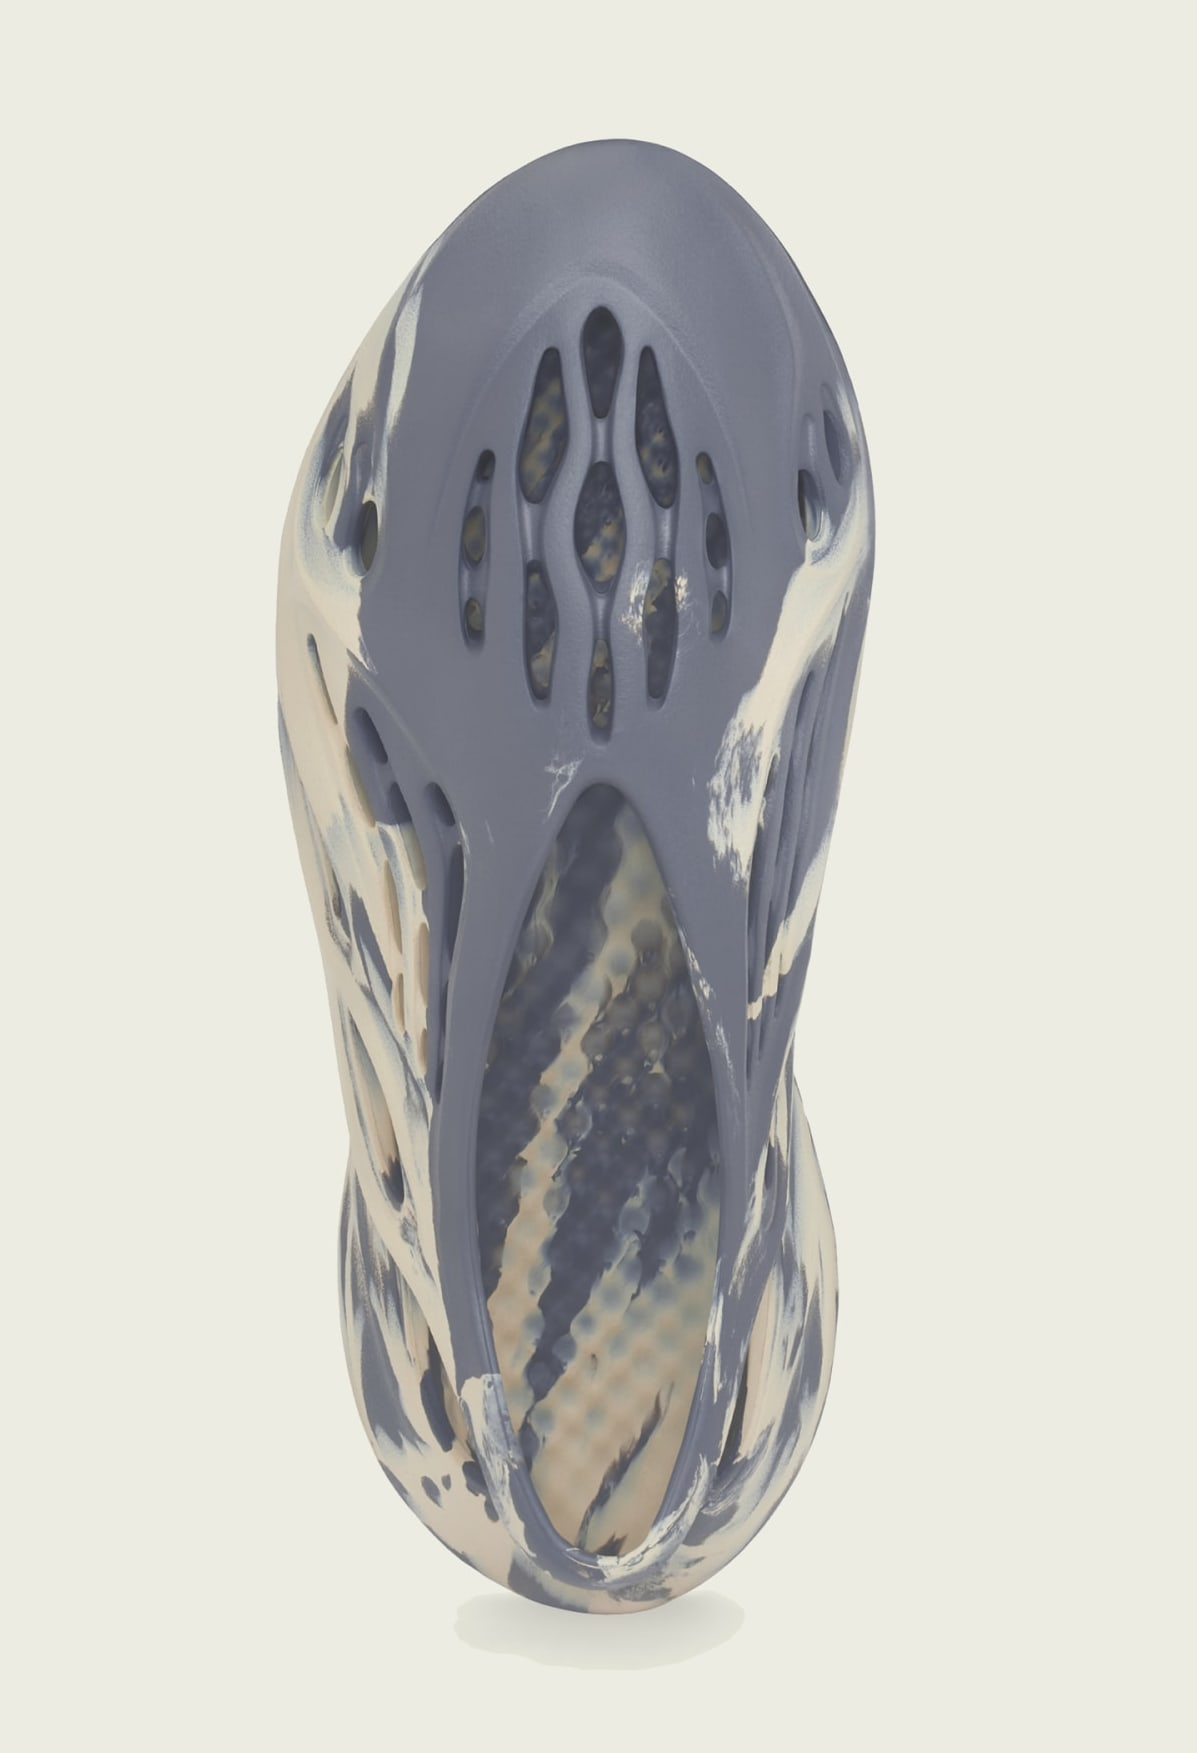 Adidas Yeezy Foam Runner 'Mxt Moon Gray' GV7904 Top